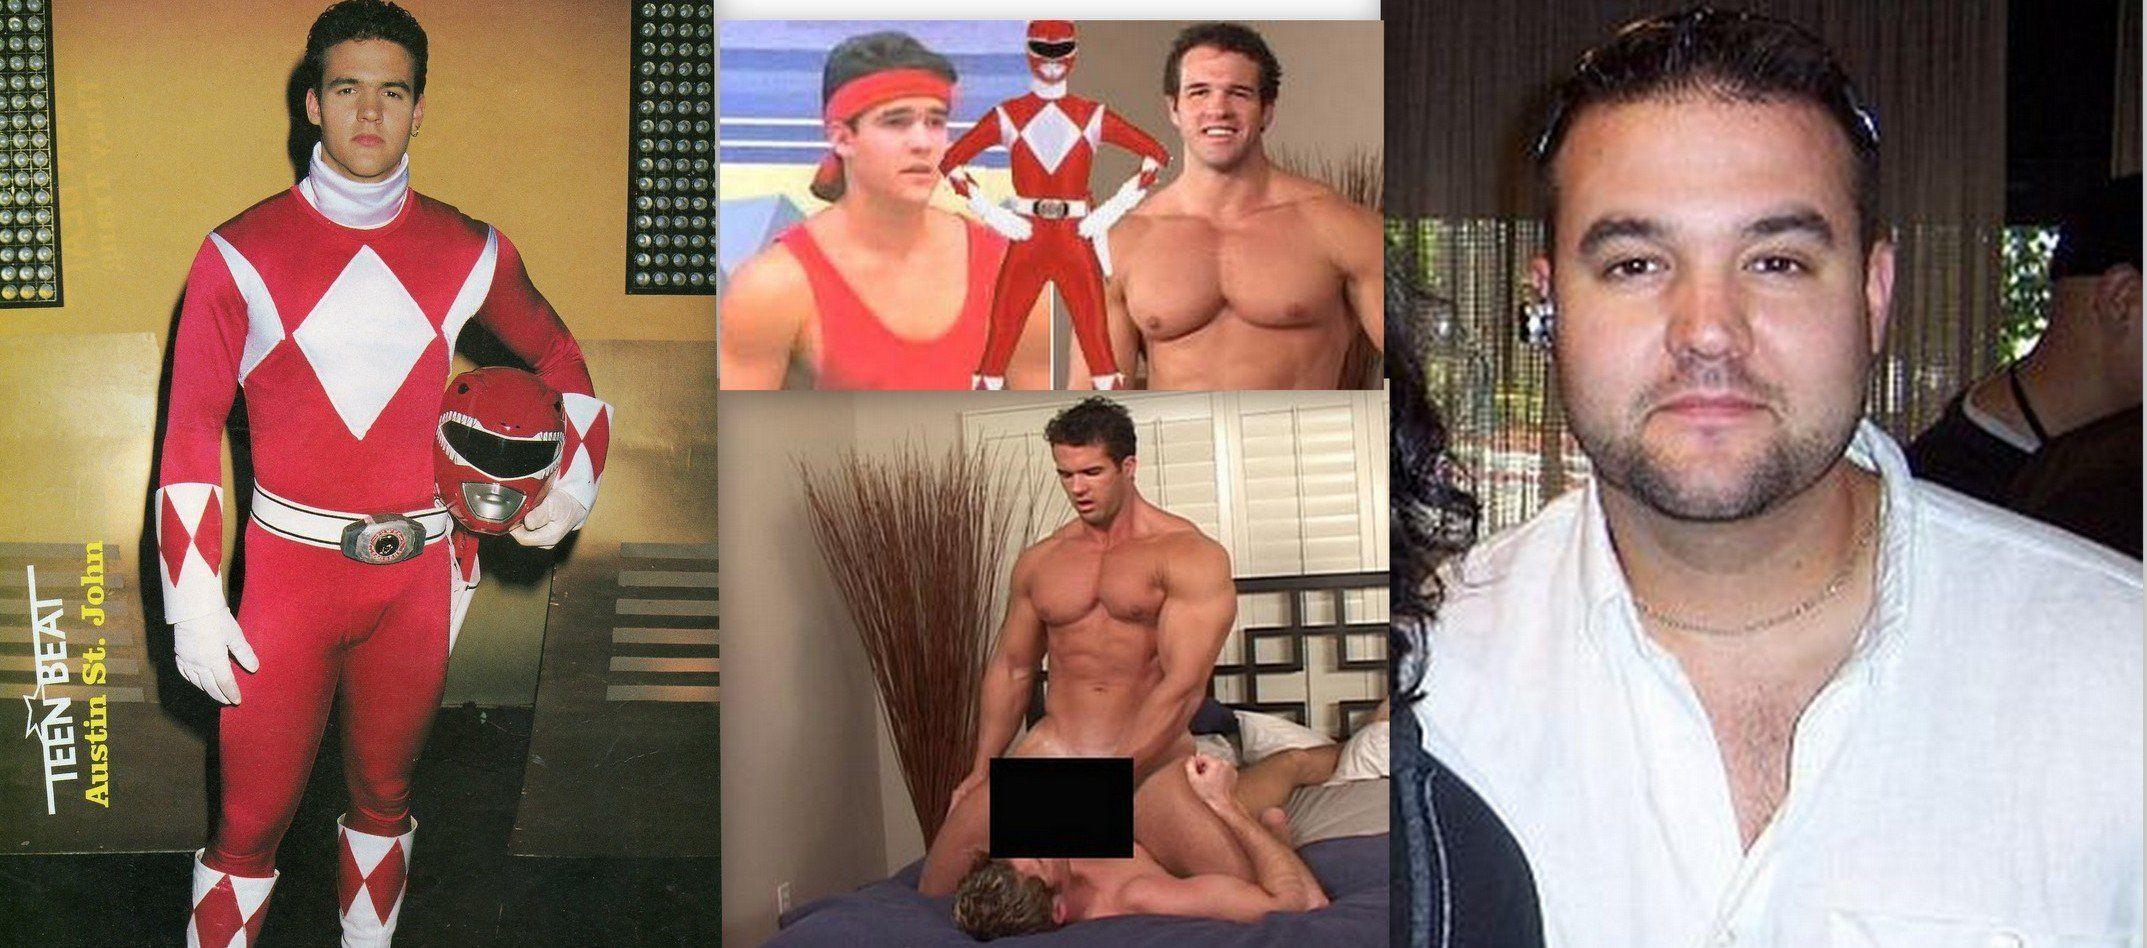 Actor Porno Gay Red red ranger now gay pornstar . new sex images.